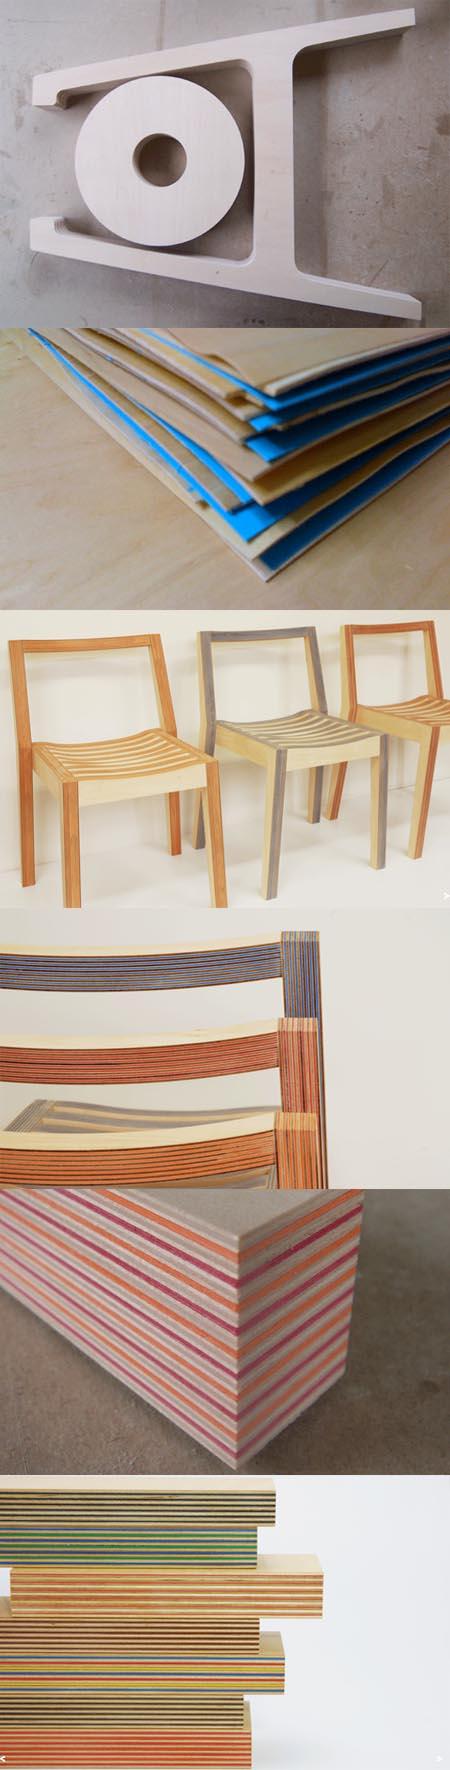 Paper wood, legno e carta